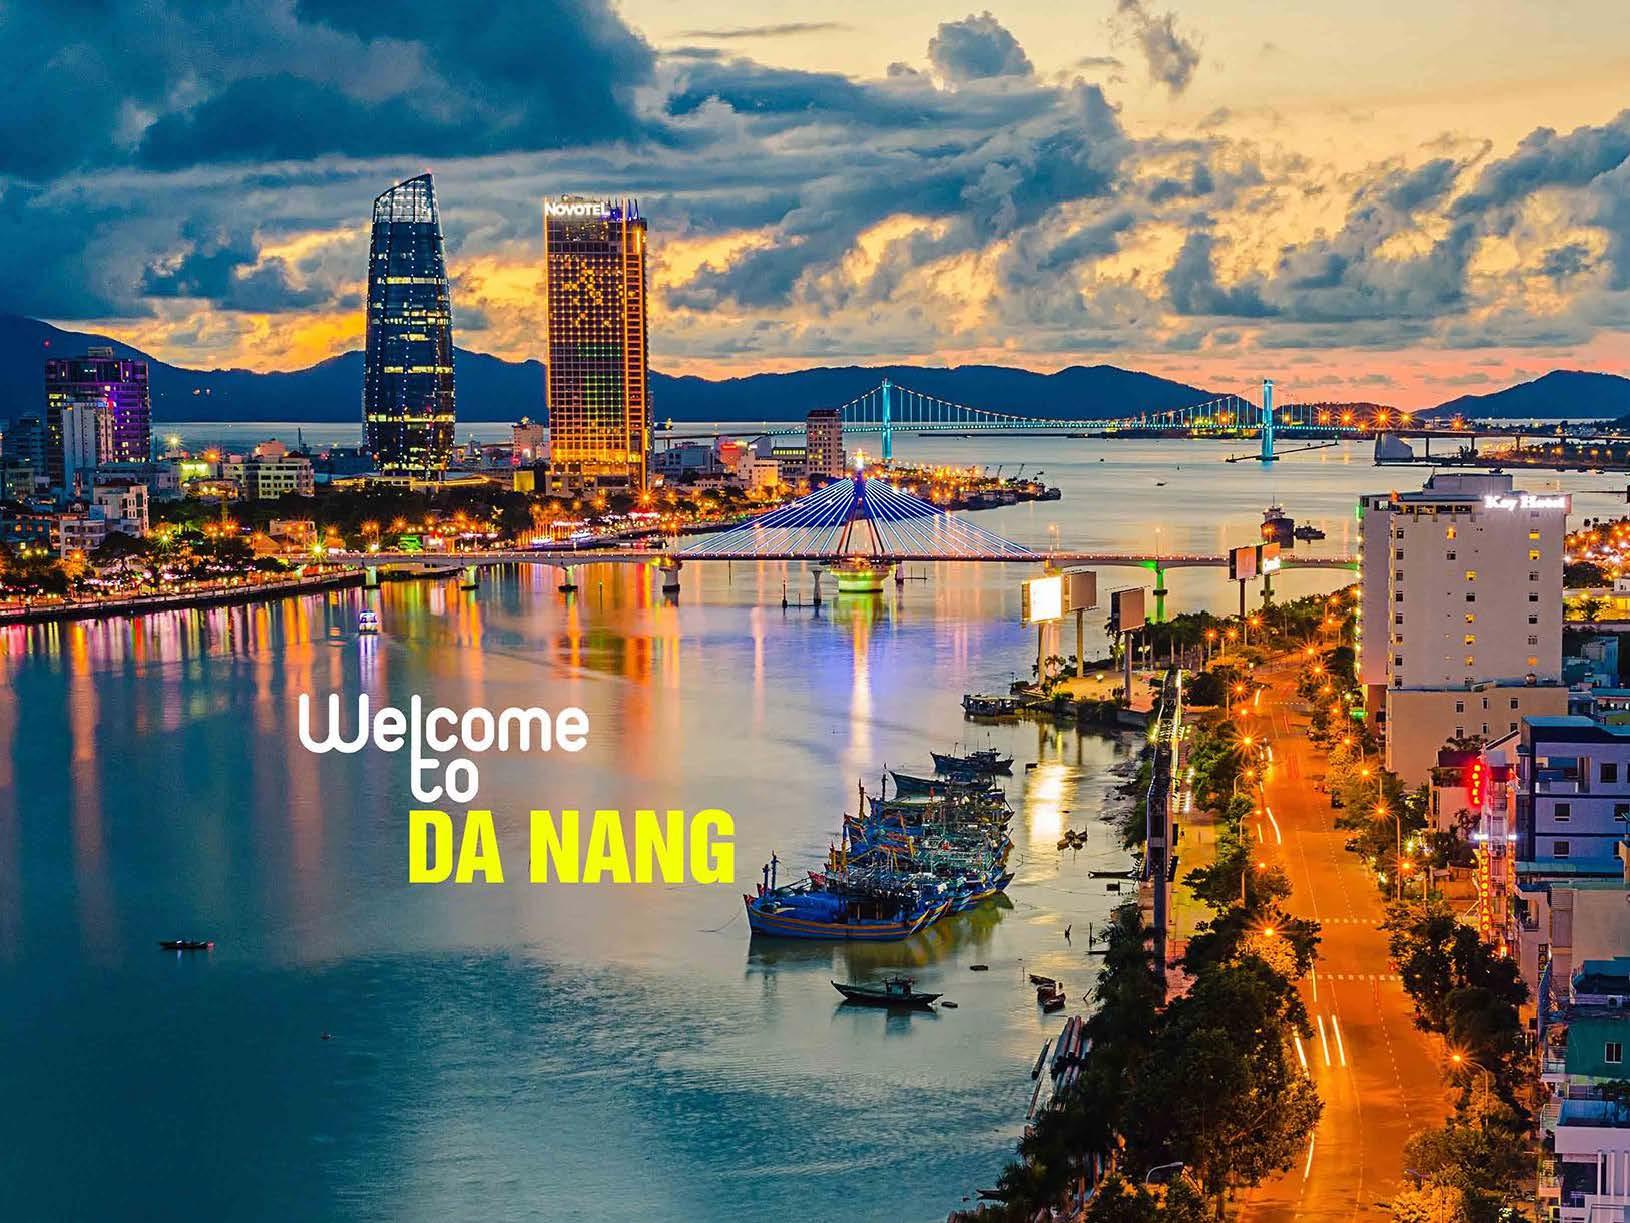 Kim Long Season - welcome to Da Nang